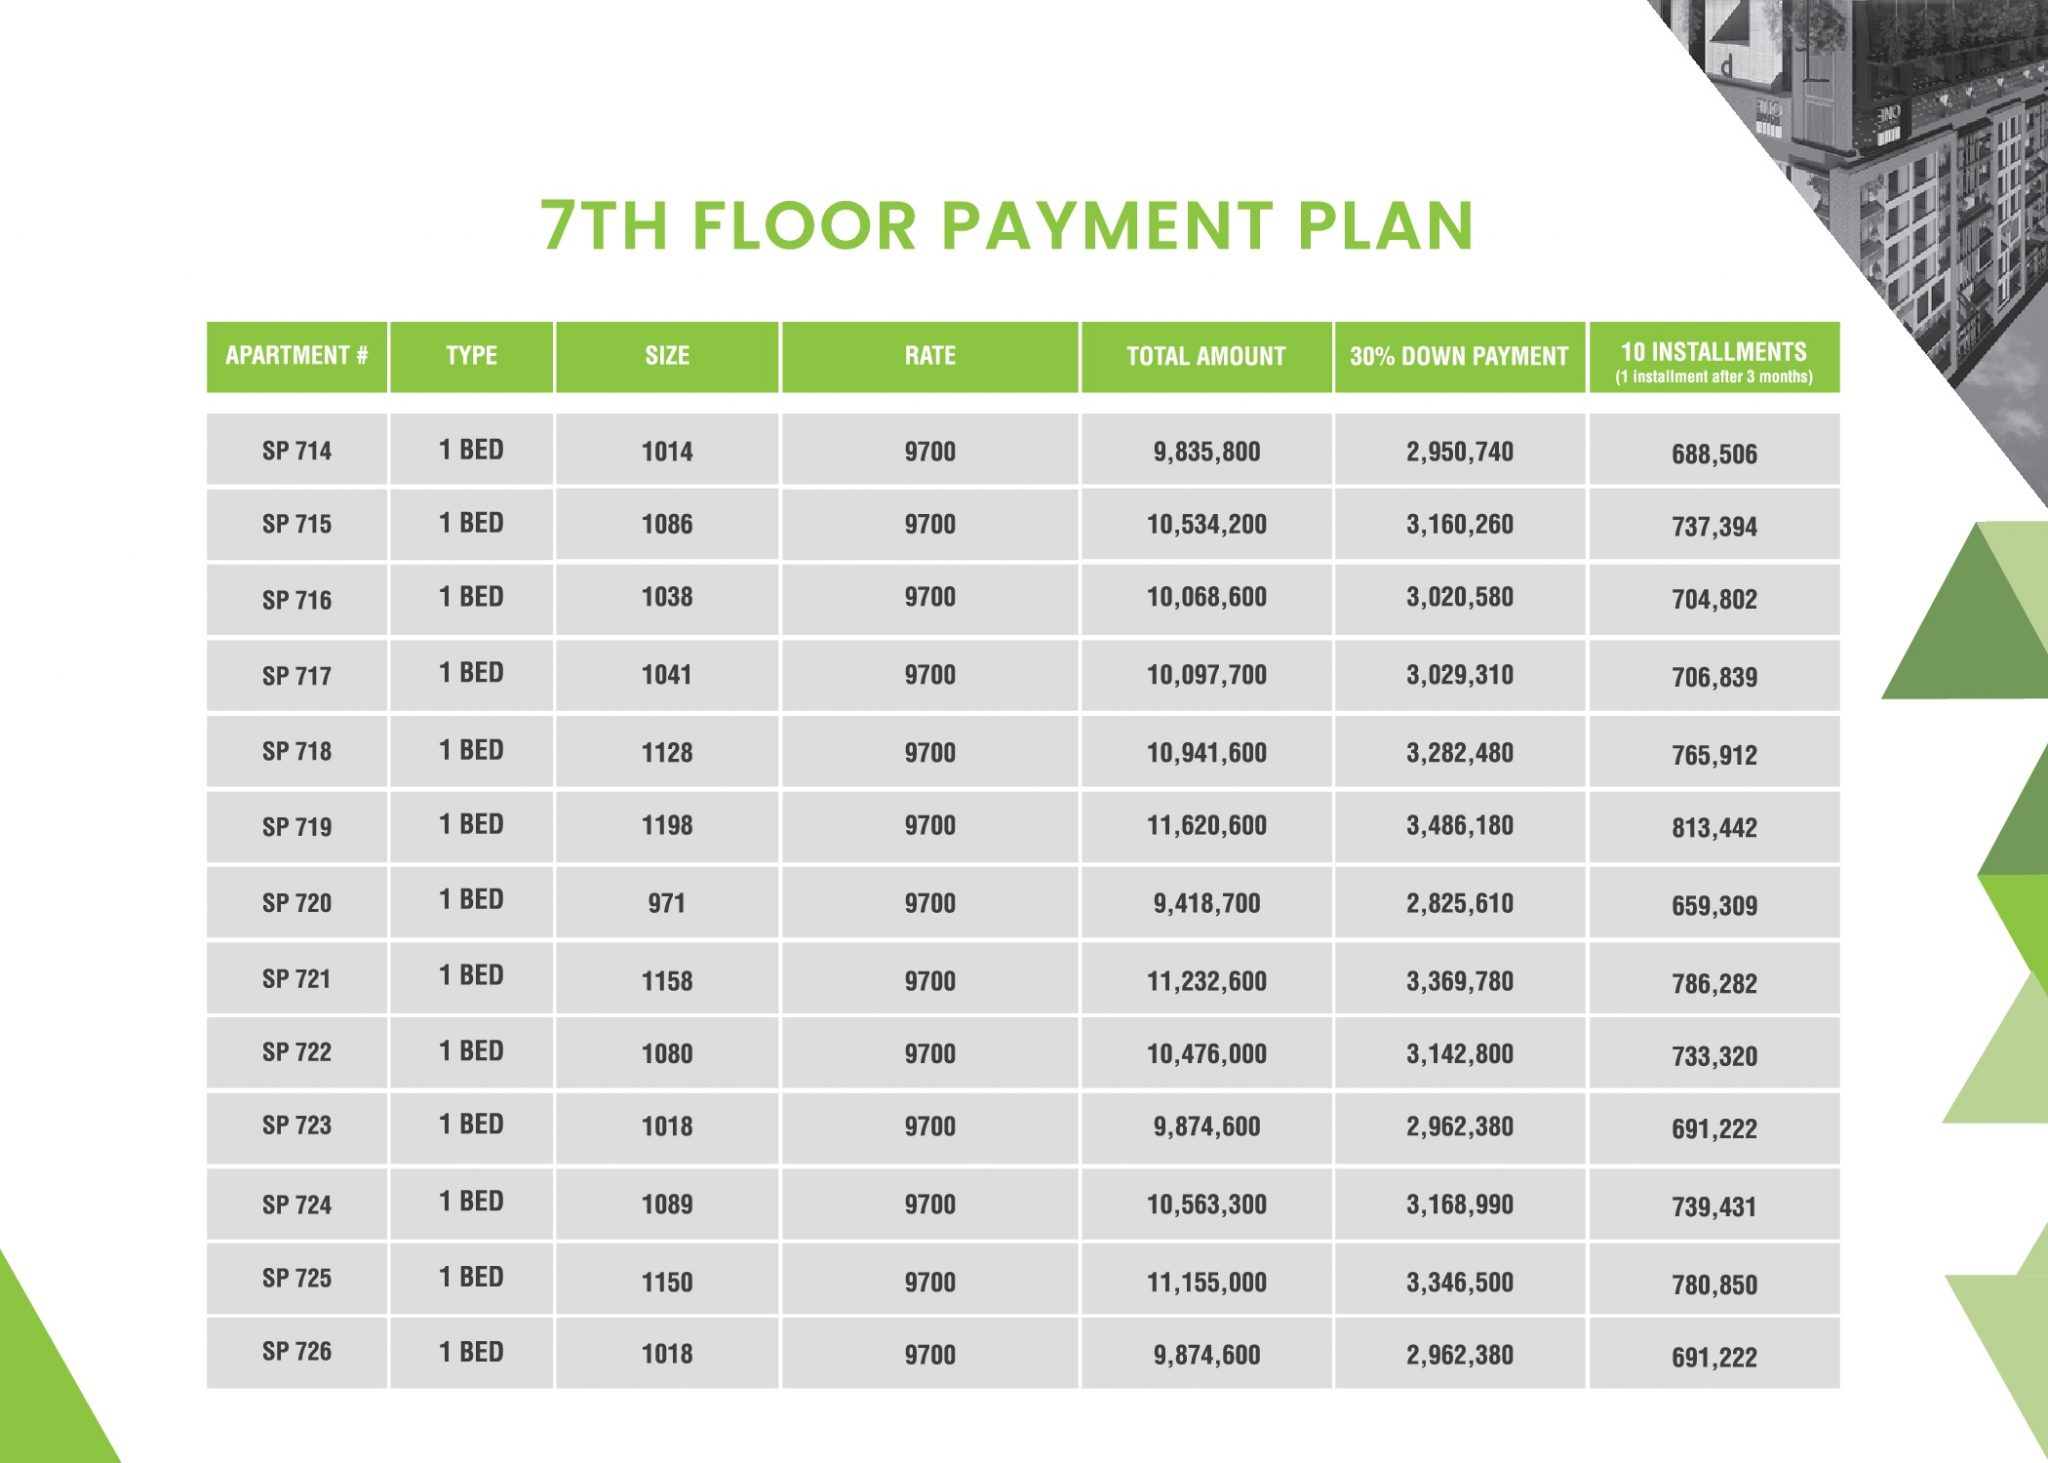 7th floor payment plan sky park one gulberg